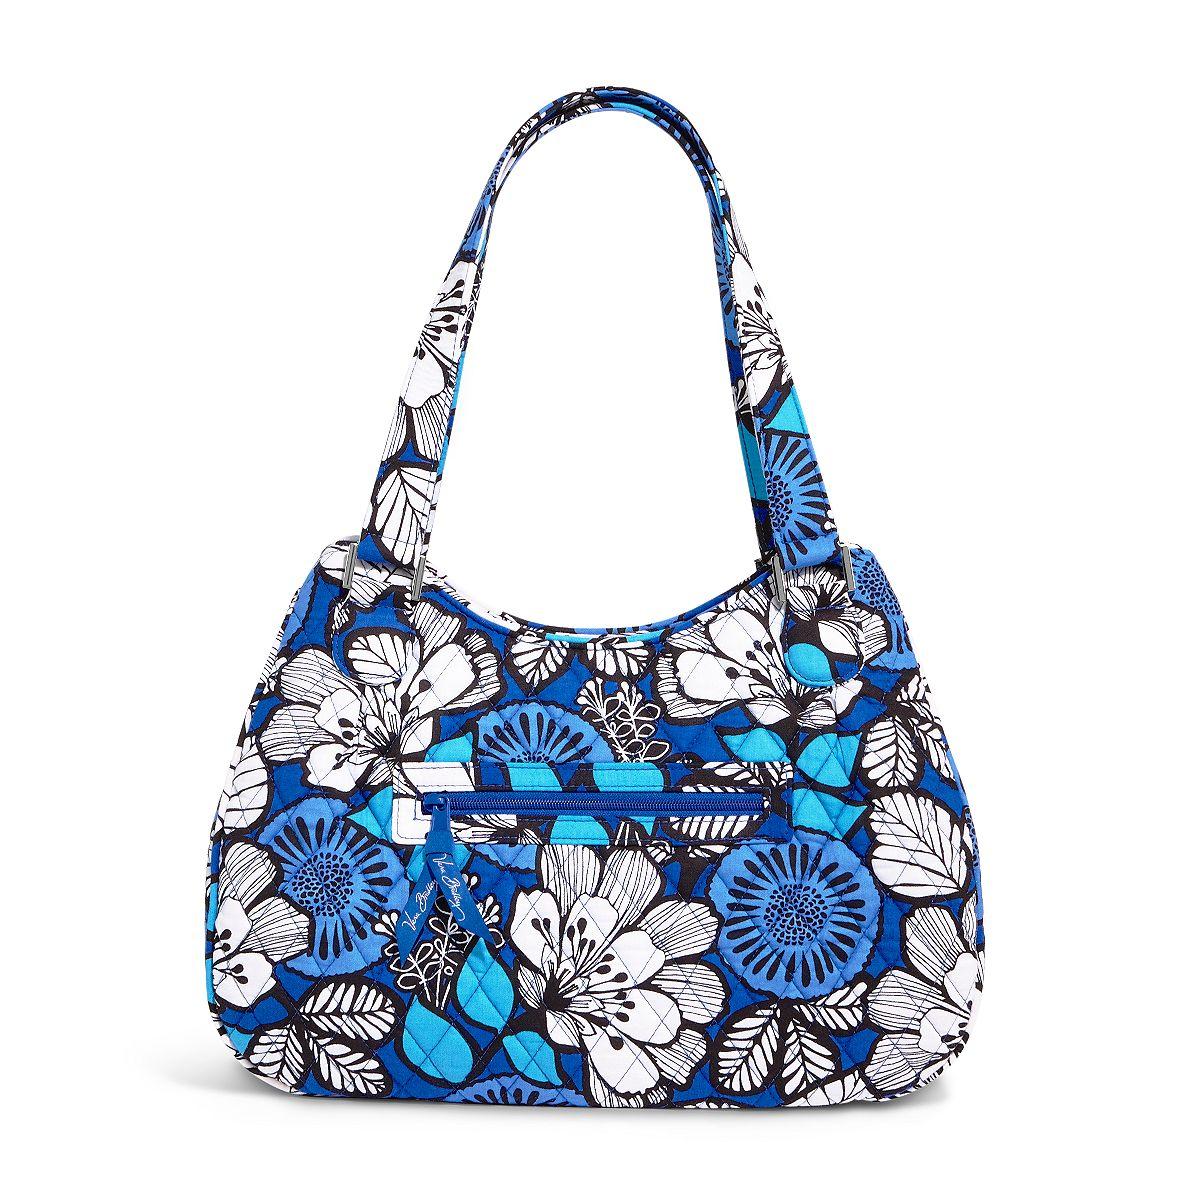 Vera Bradley Handbags: Vera Bradley Bag Style Names